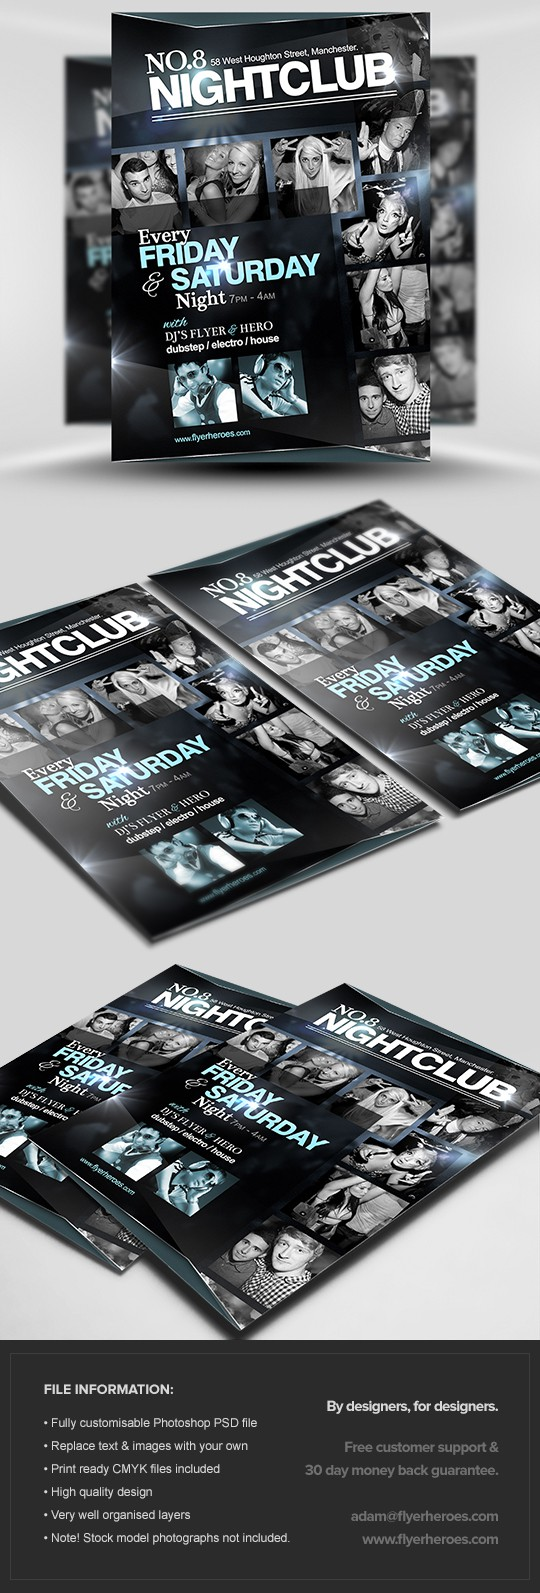 No.8 Nightclub Flyer Template